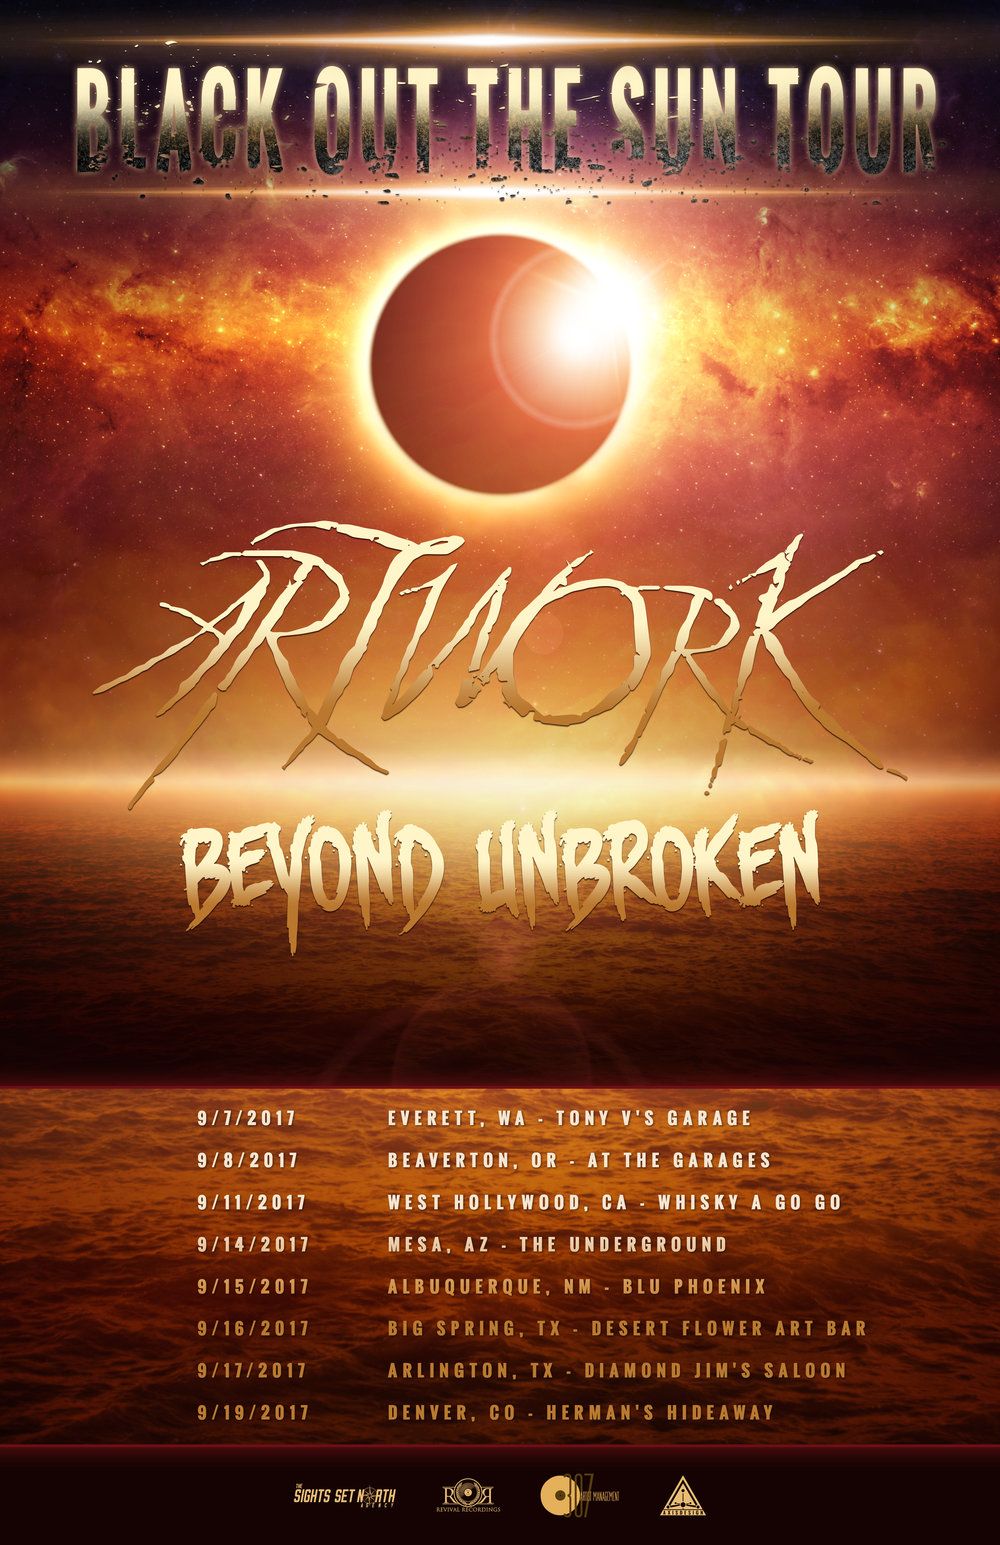 Black Out The Sun Tour - Dates.jpg